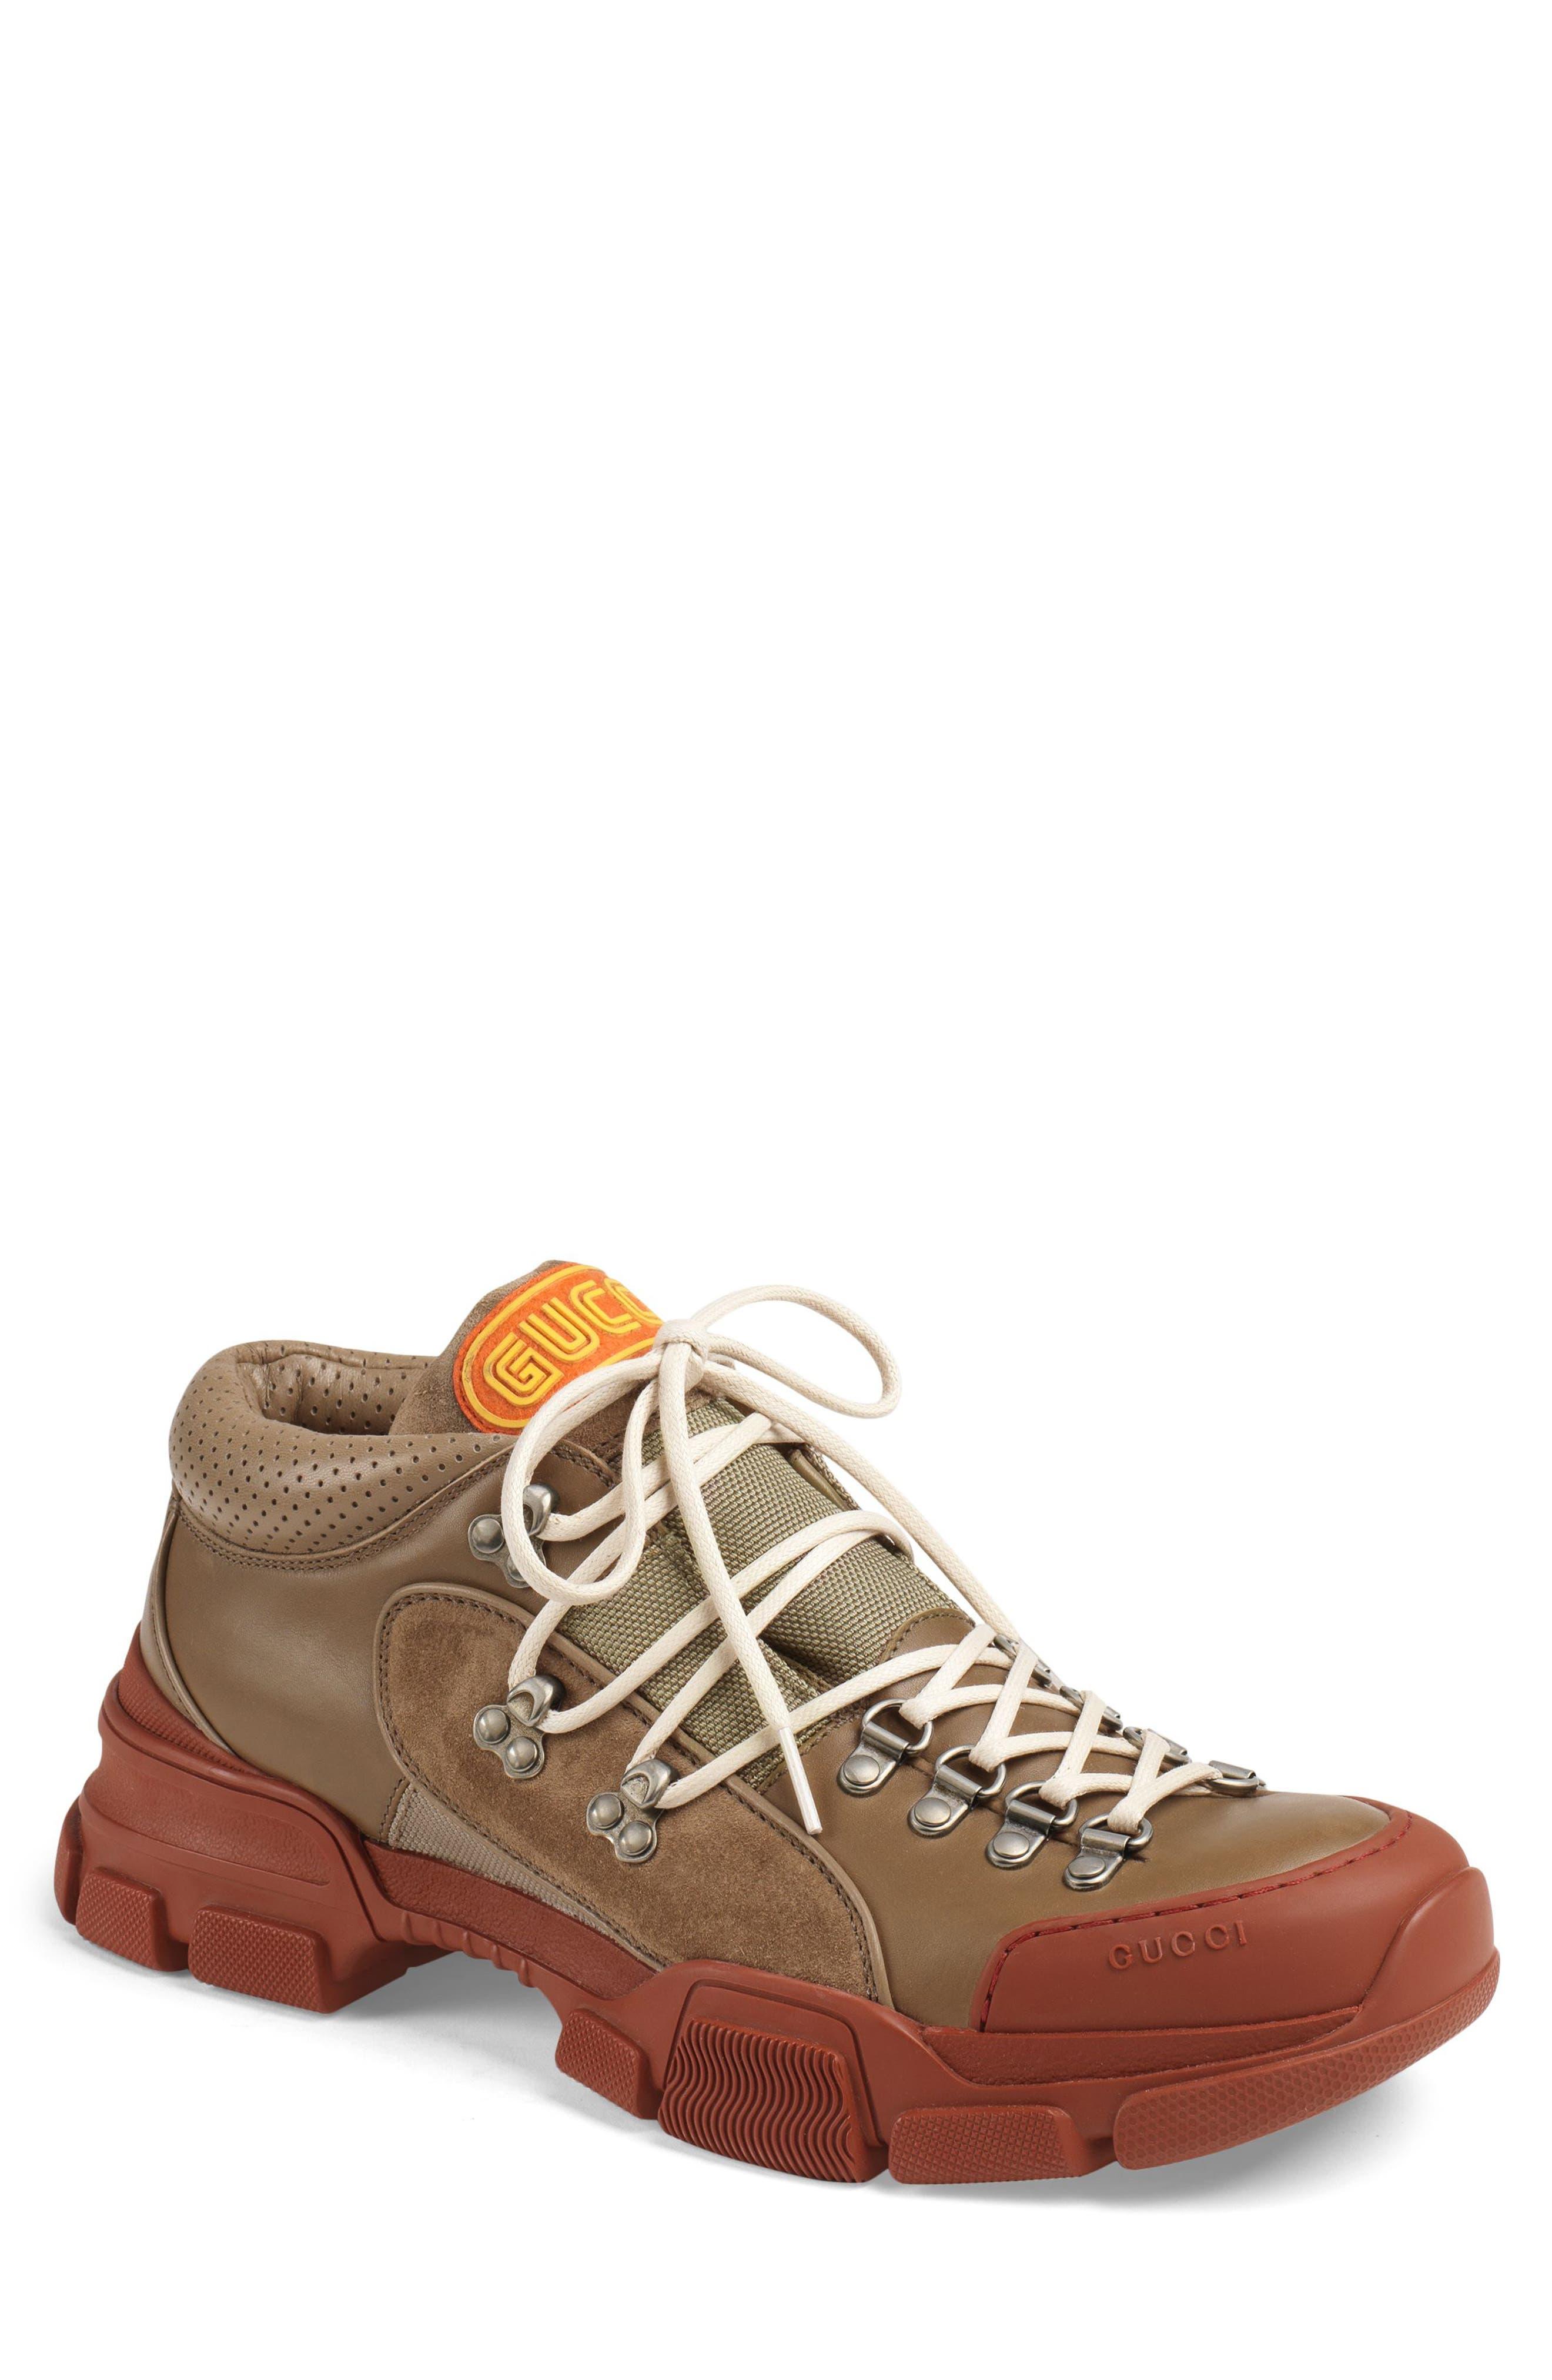 30a8dec377710 Gucci Leather   Original Gg Trekking Boot